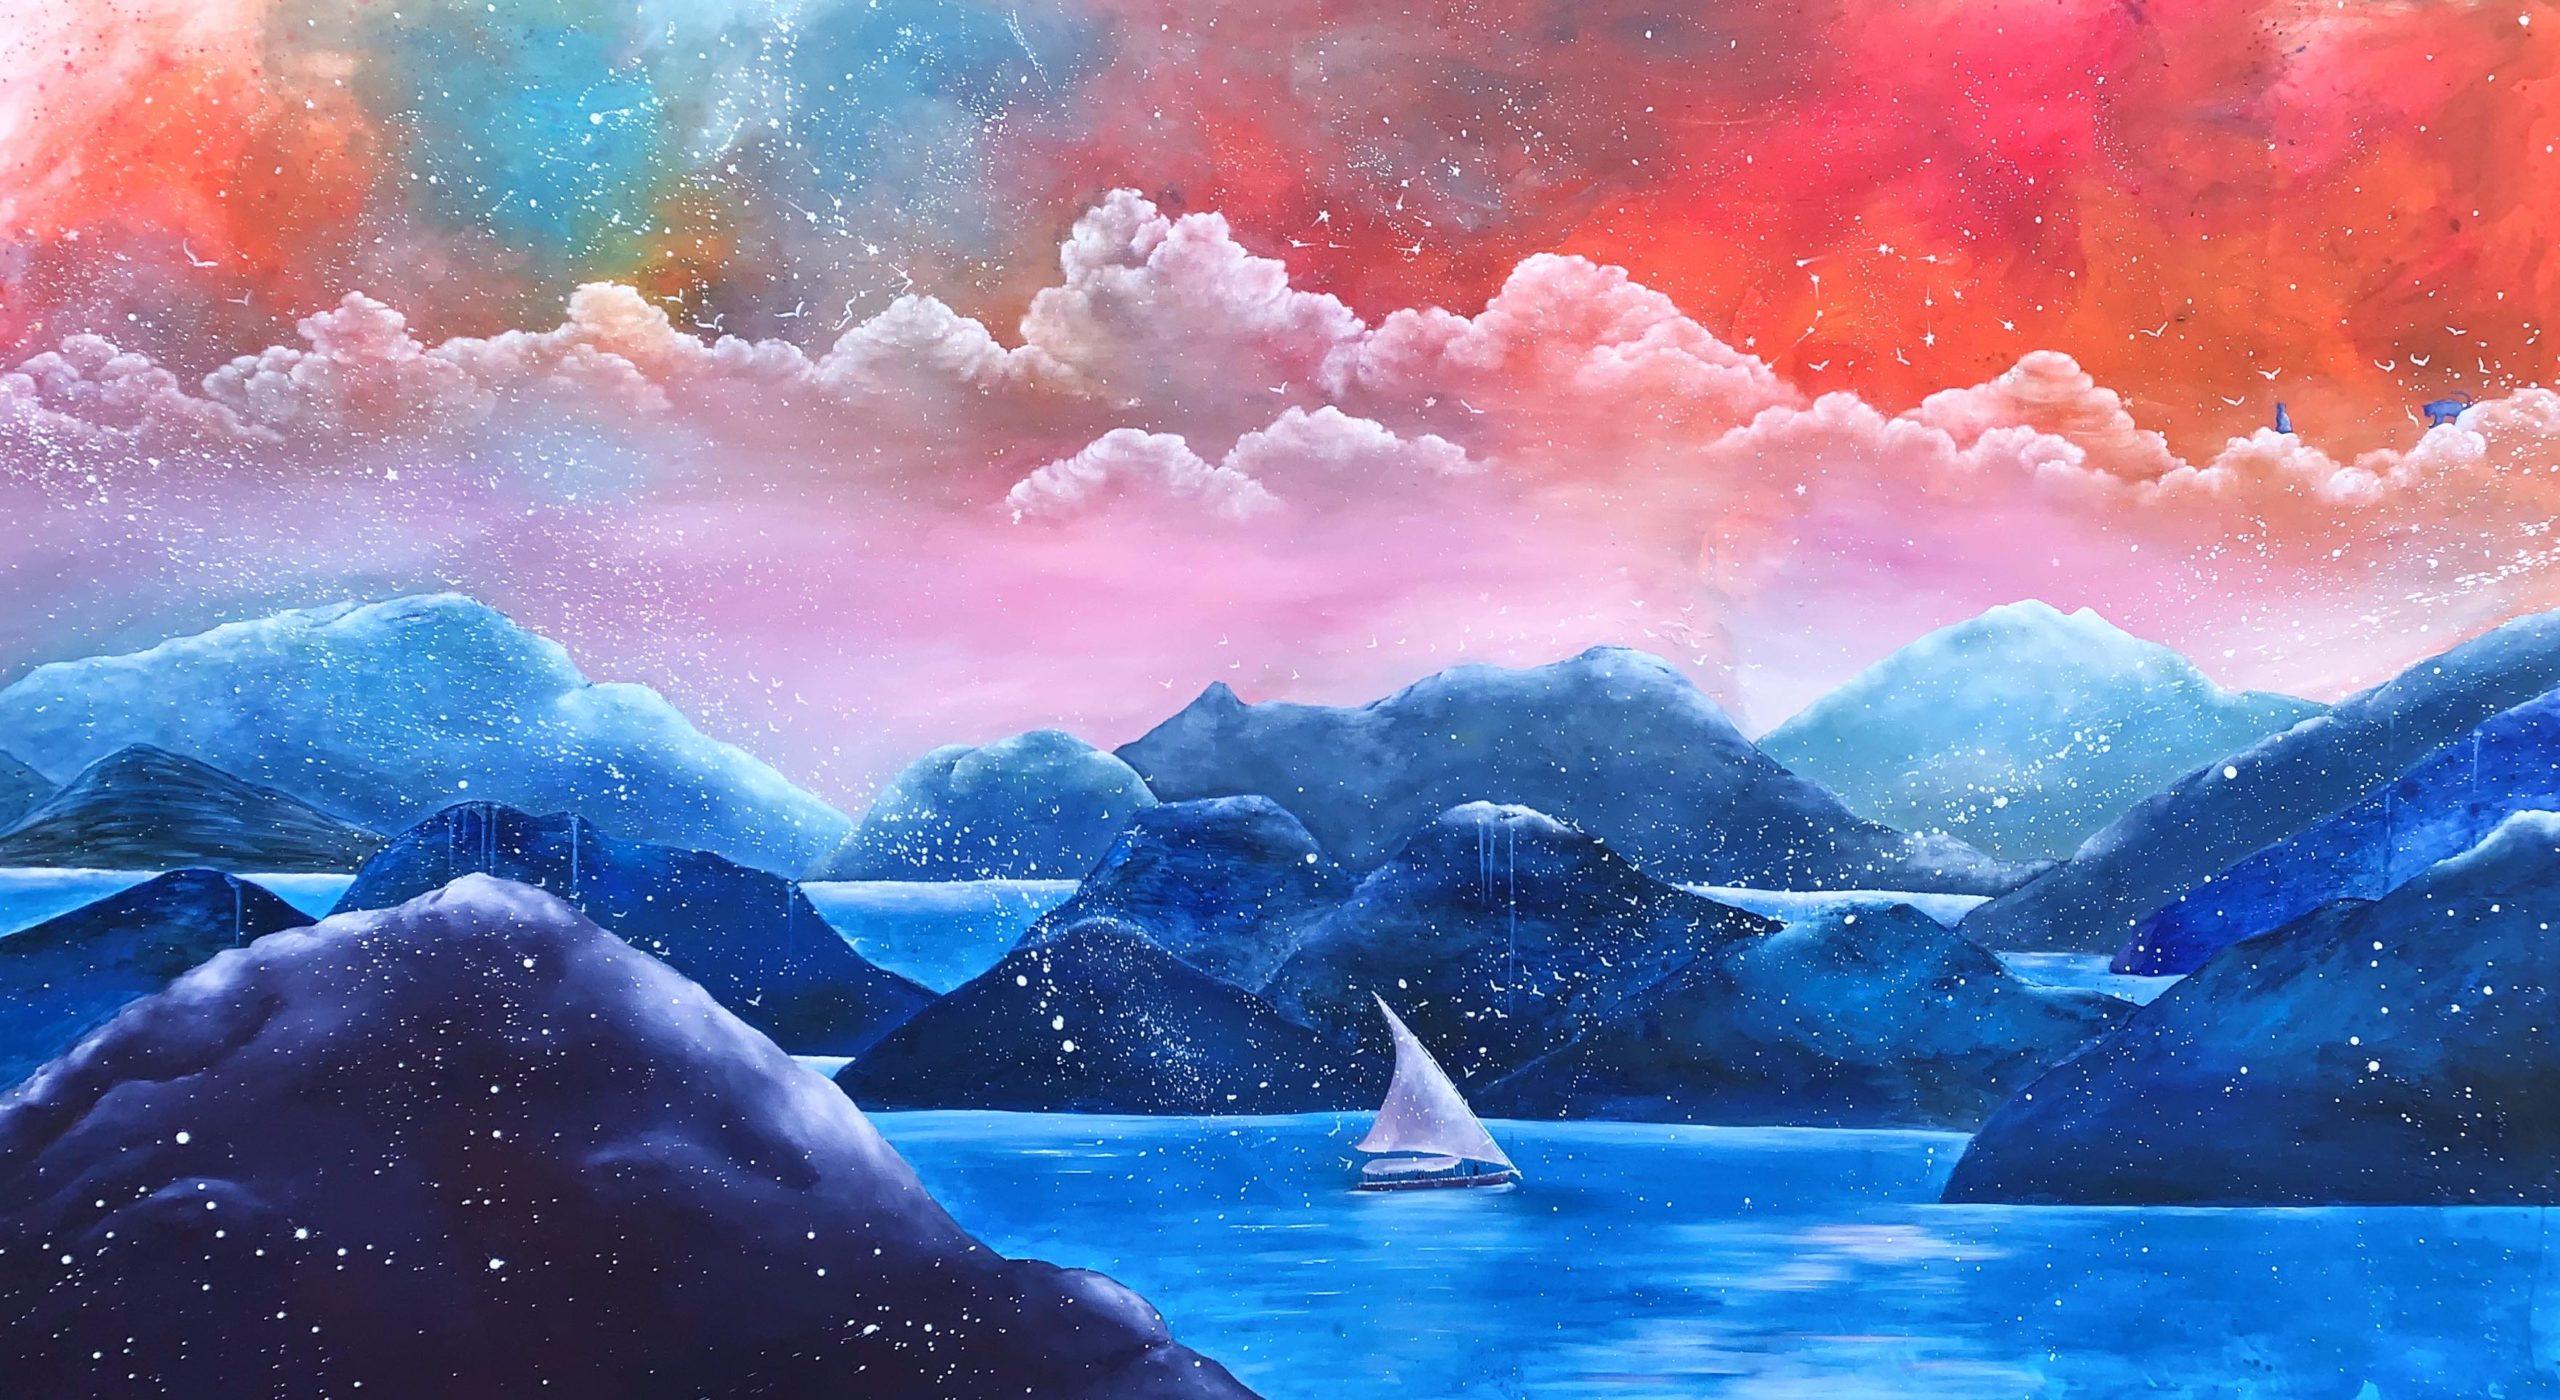 Nadeen El Rashidy, Lucy in the Sky with Diamonds, 2020, oil on canvas, 160 X 290 cm.